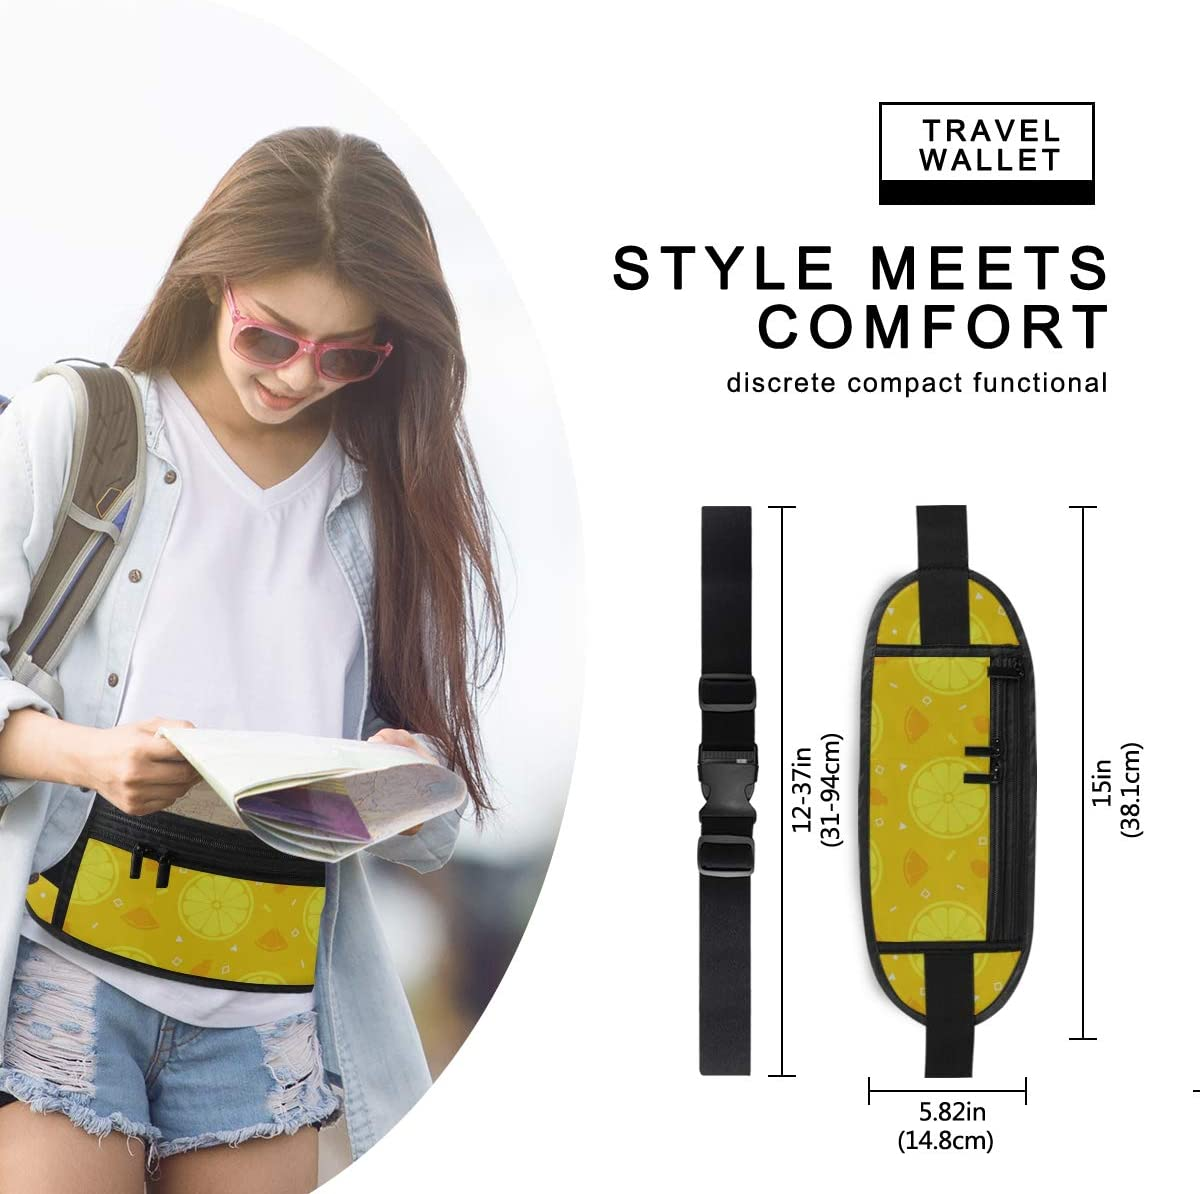 Travel Waist Pack,travel Pocket With Adjustable Belt Lemon Orange Fruits Pattern Running Lumbar Pack For Travel Outdoor Sports Walking